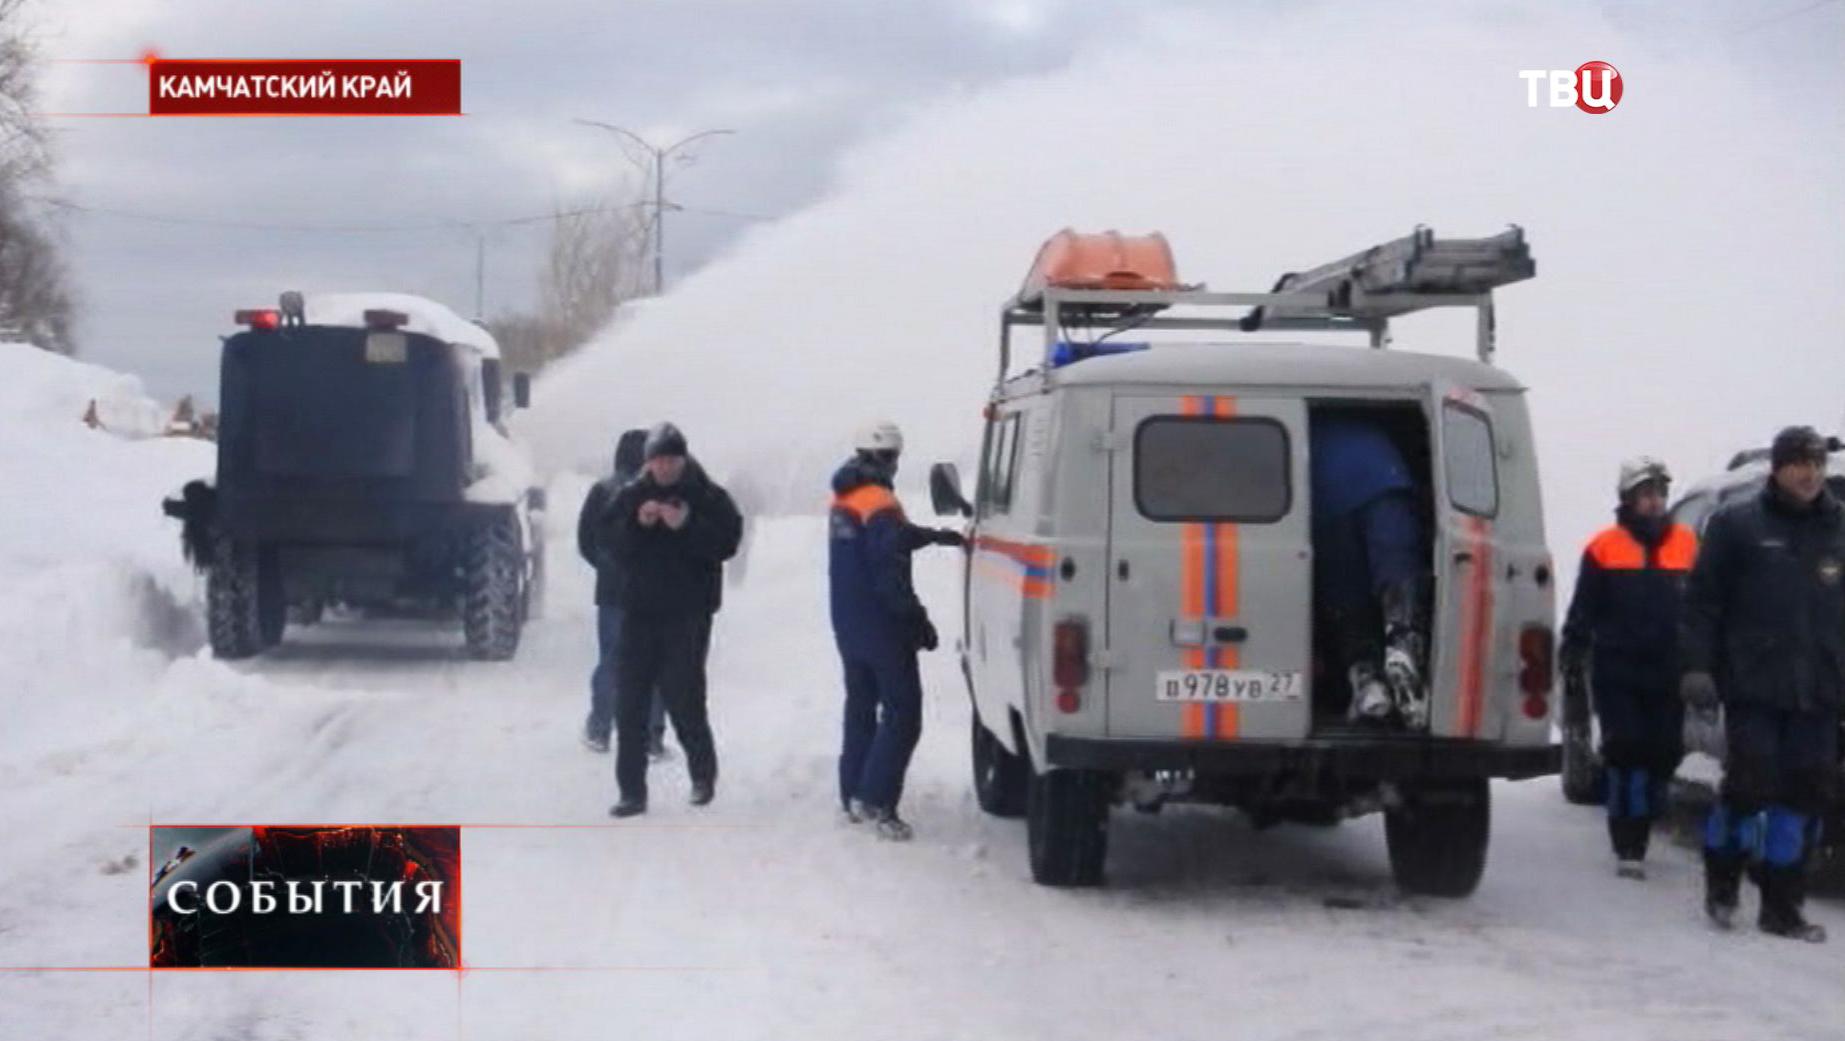 Ликвидация последствий снегопада на Камчатке